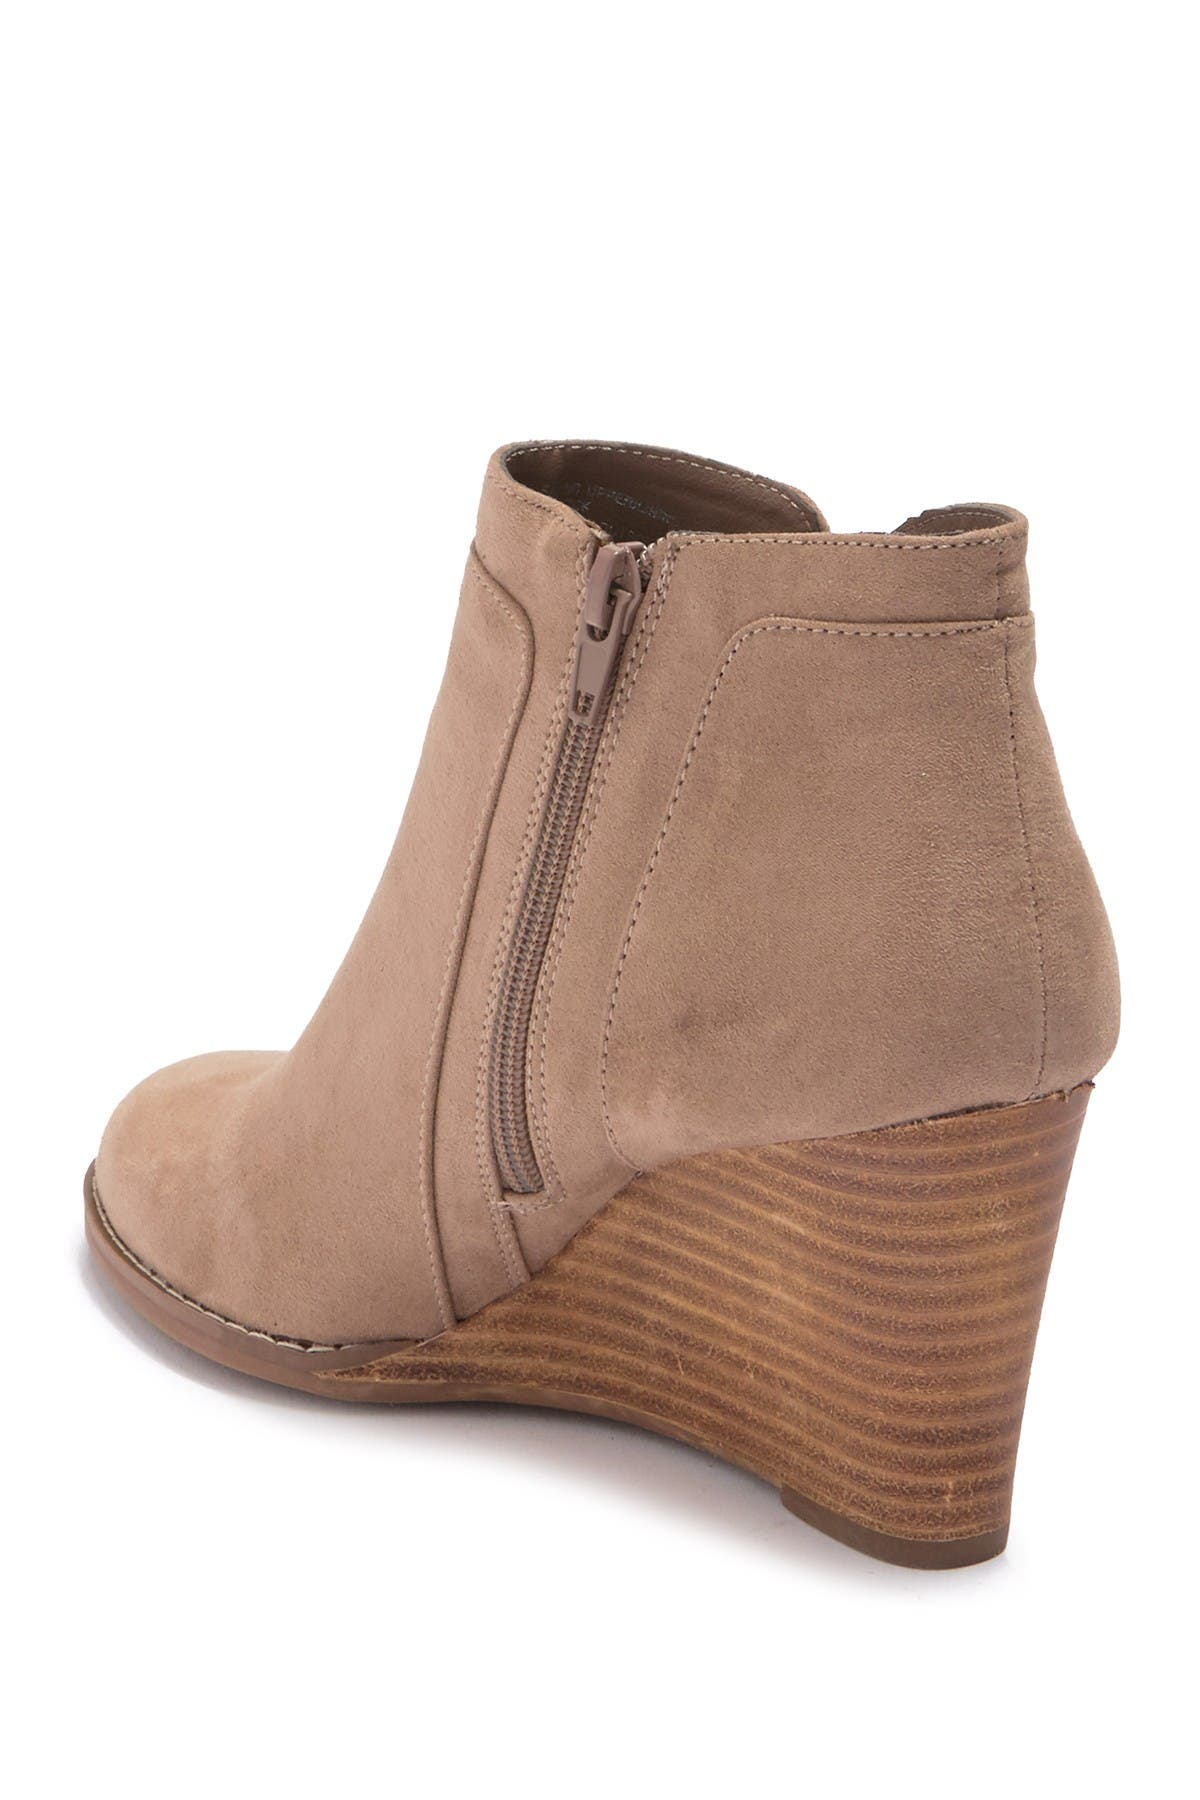 Madden Girl | Greteel Wedge Ankle Boot